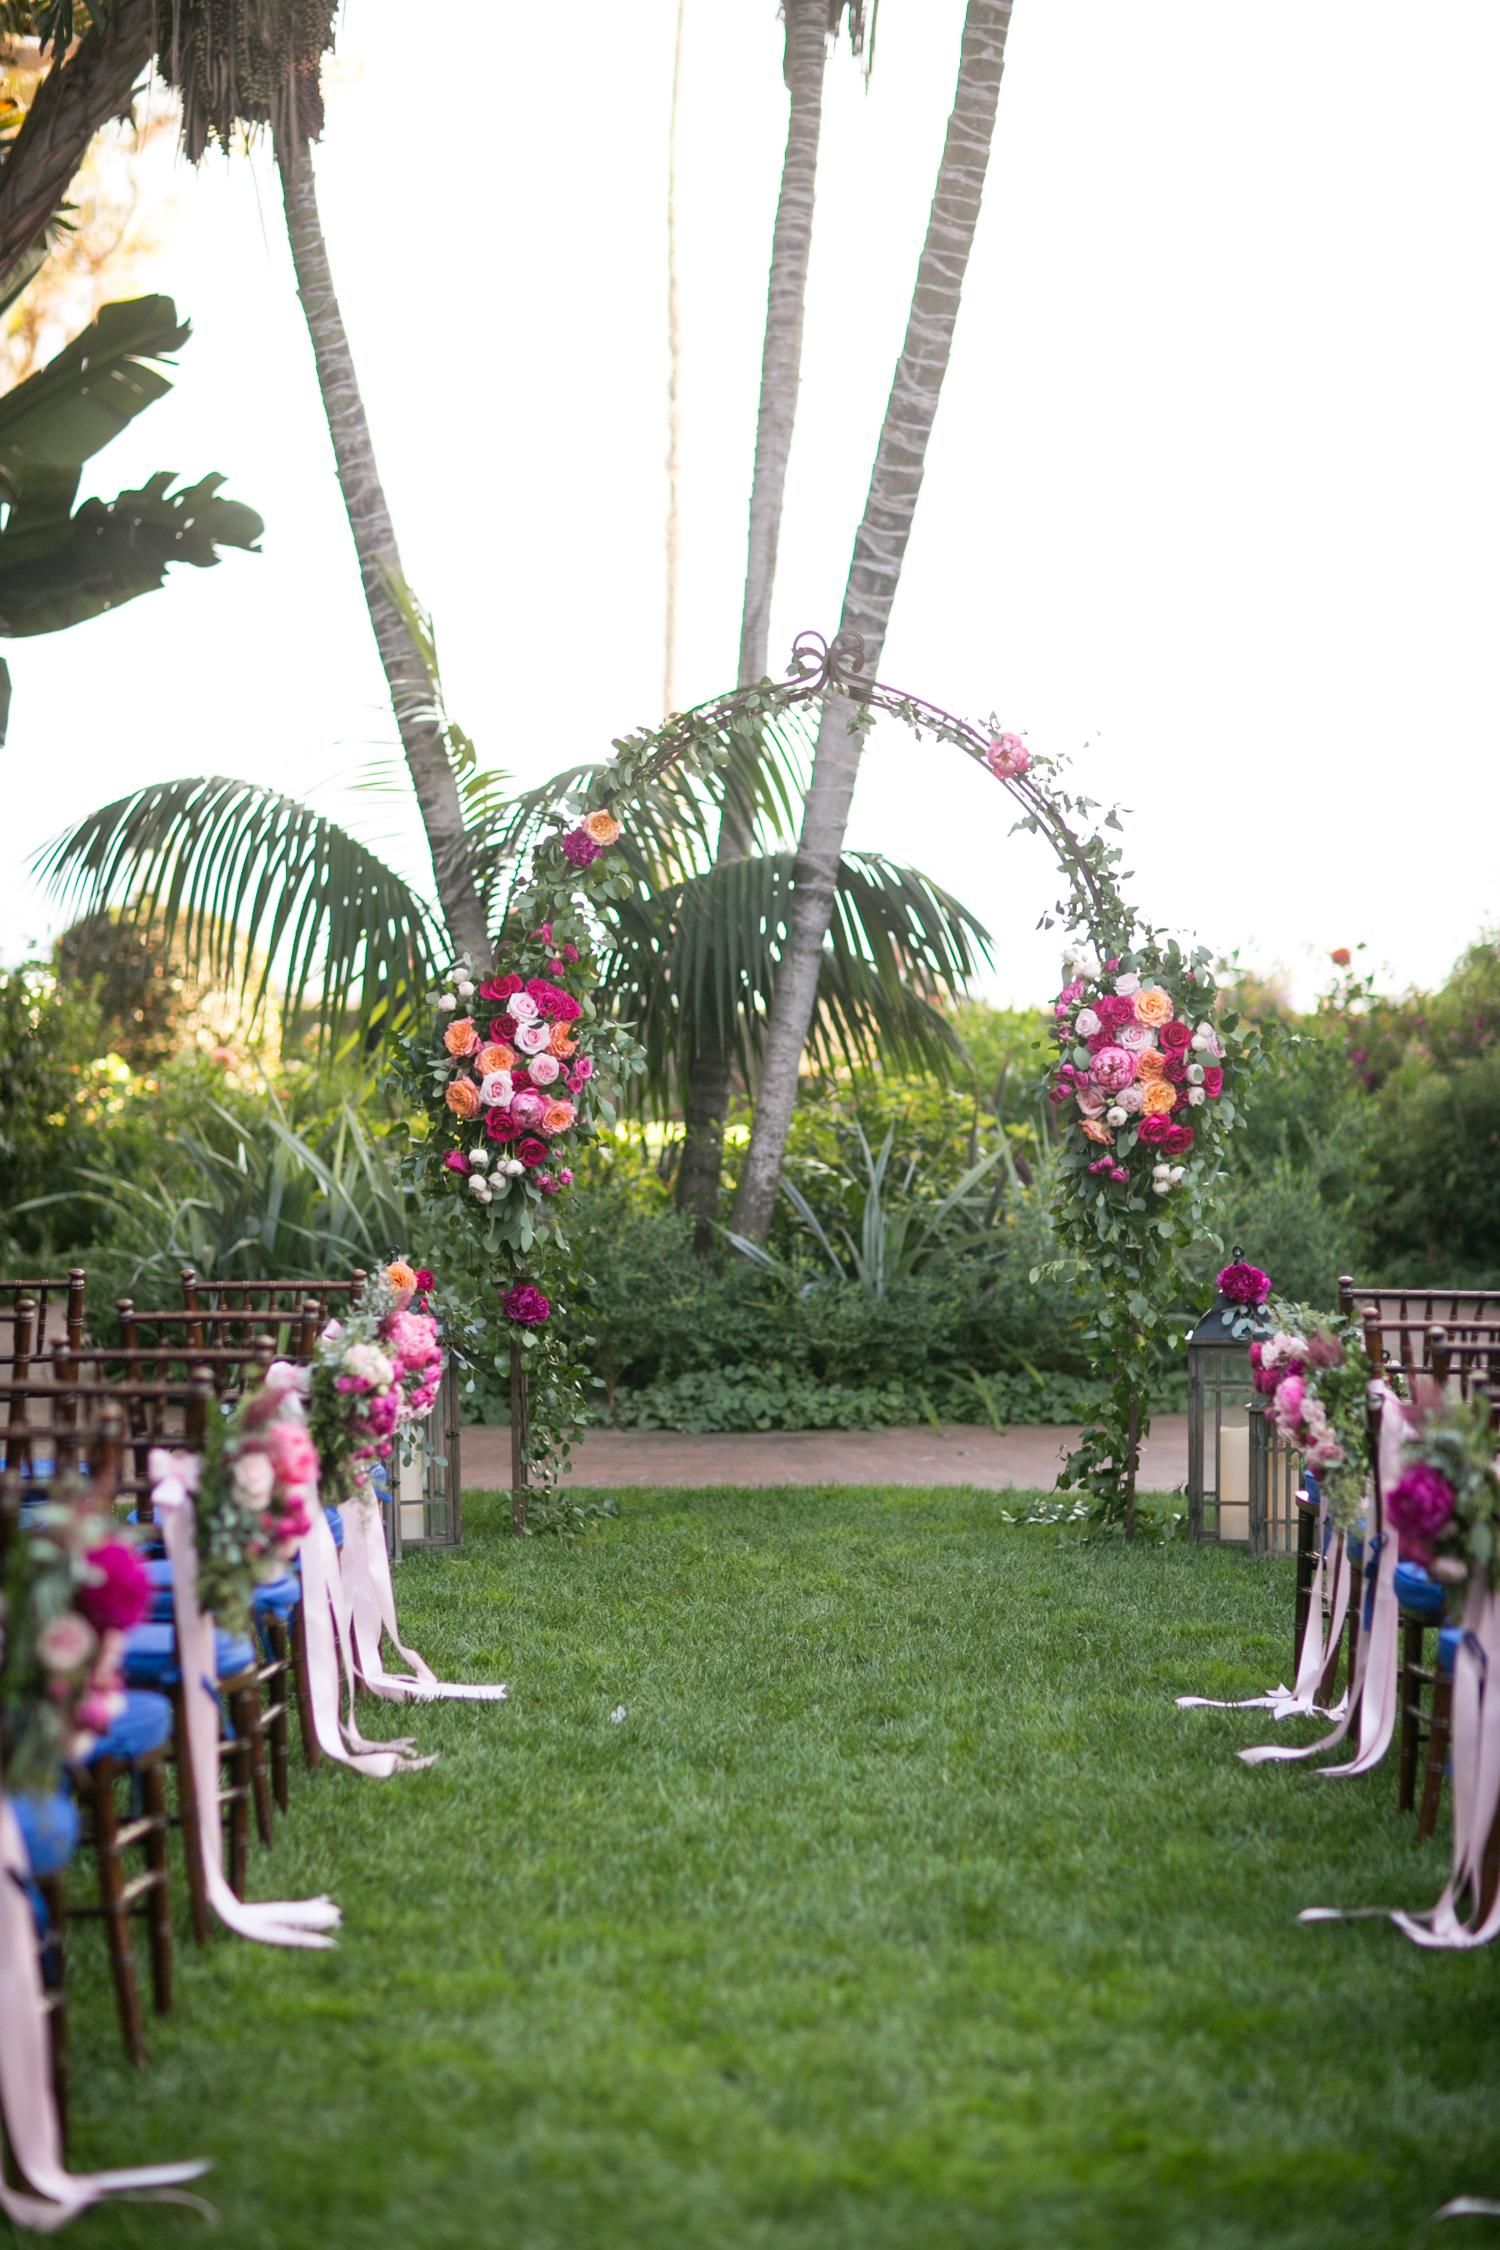 www.santabarbarawedding.com | Miki & Sonja Photography | Four Seasons Resort The Biltmore | Imagine Weddings & Special Events | Rockrose Floral Design | Ceremony Arbor